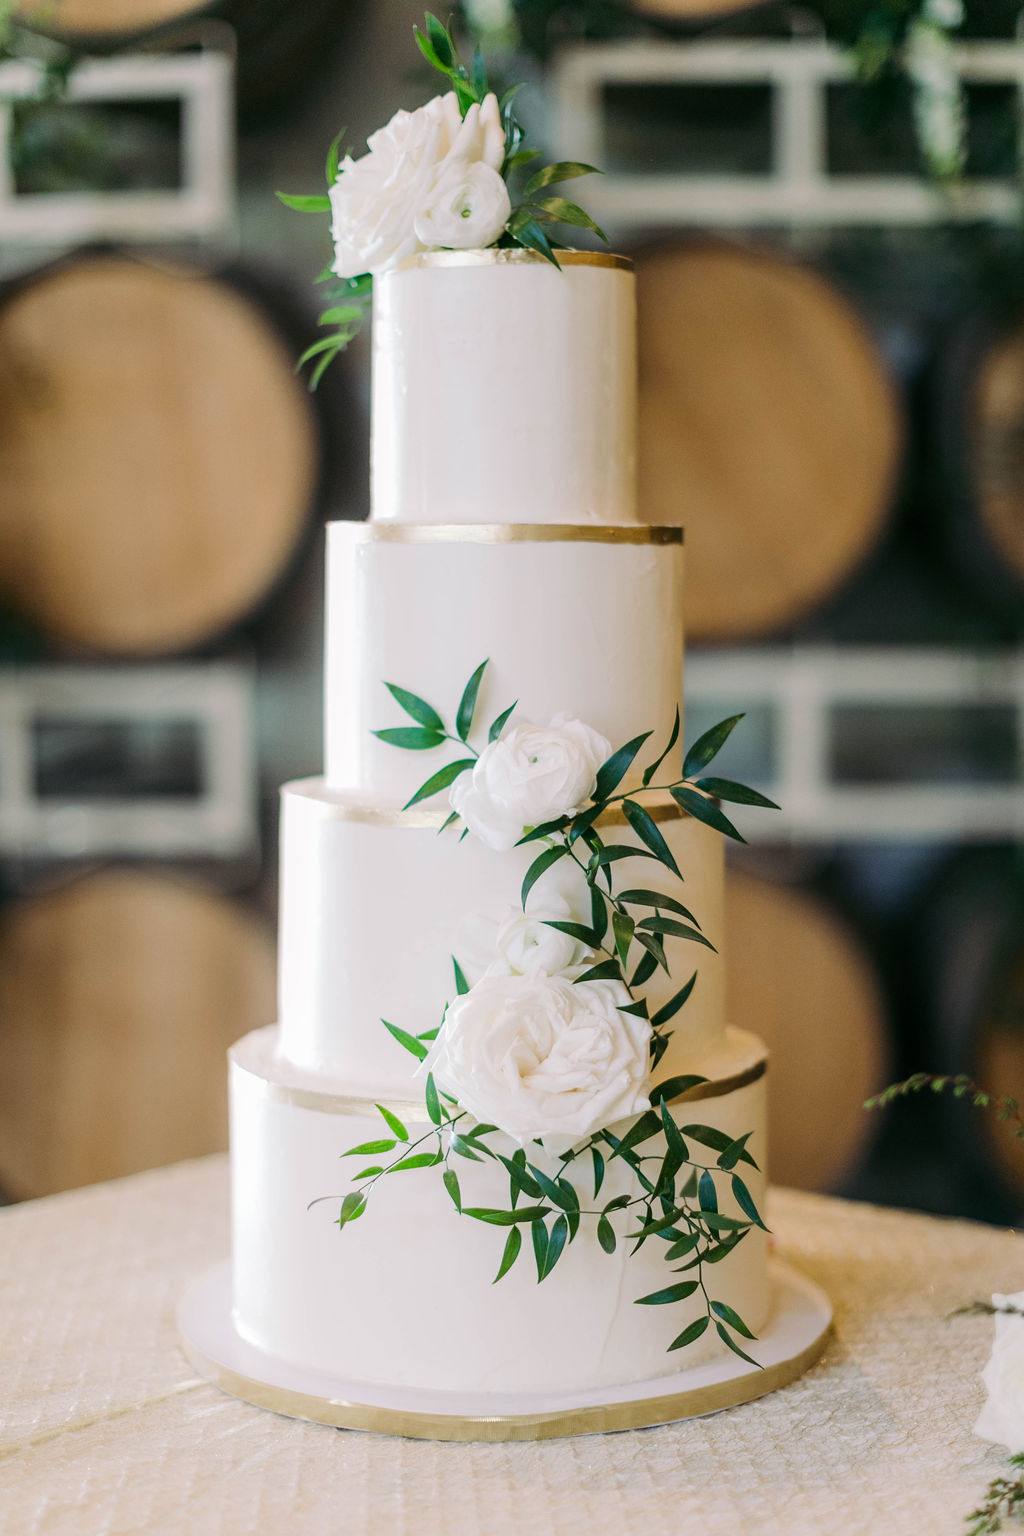 Brides Classic Cake | Sinfully Sweet Cake Design | Austin Planner